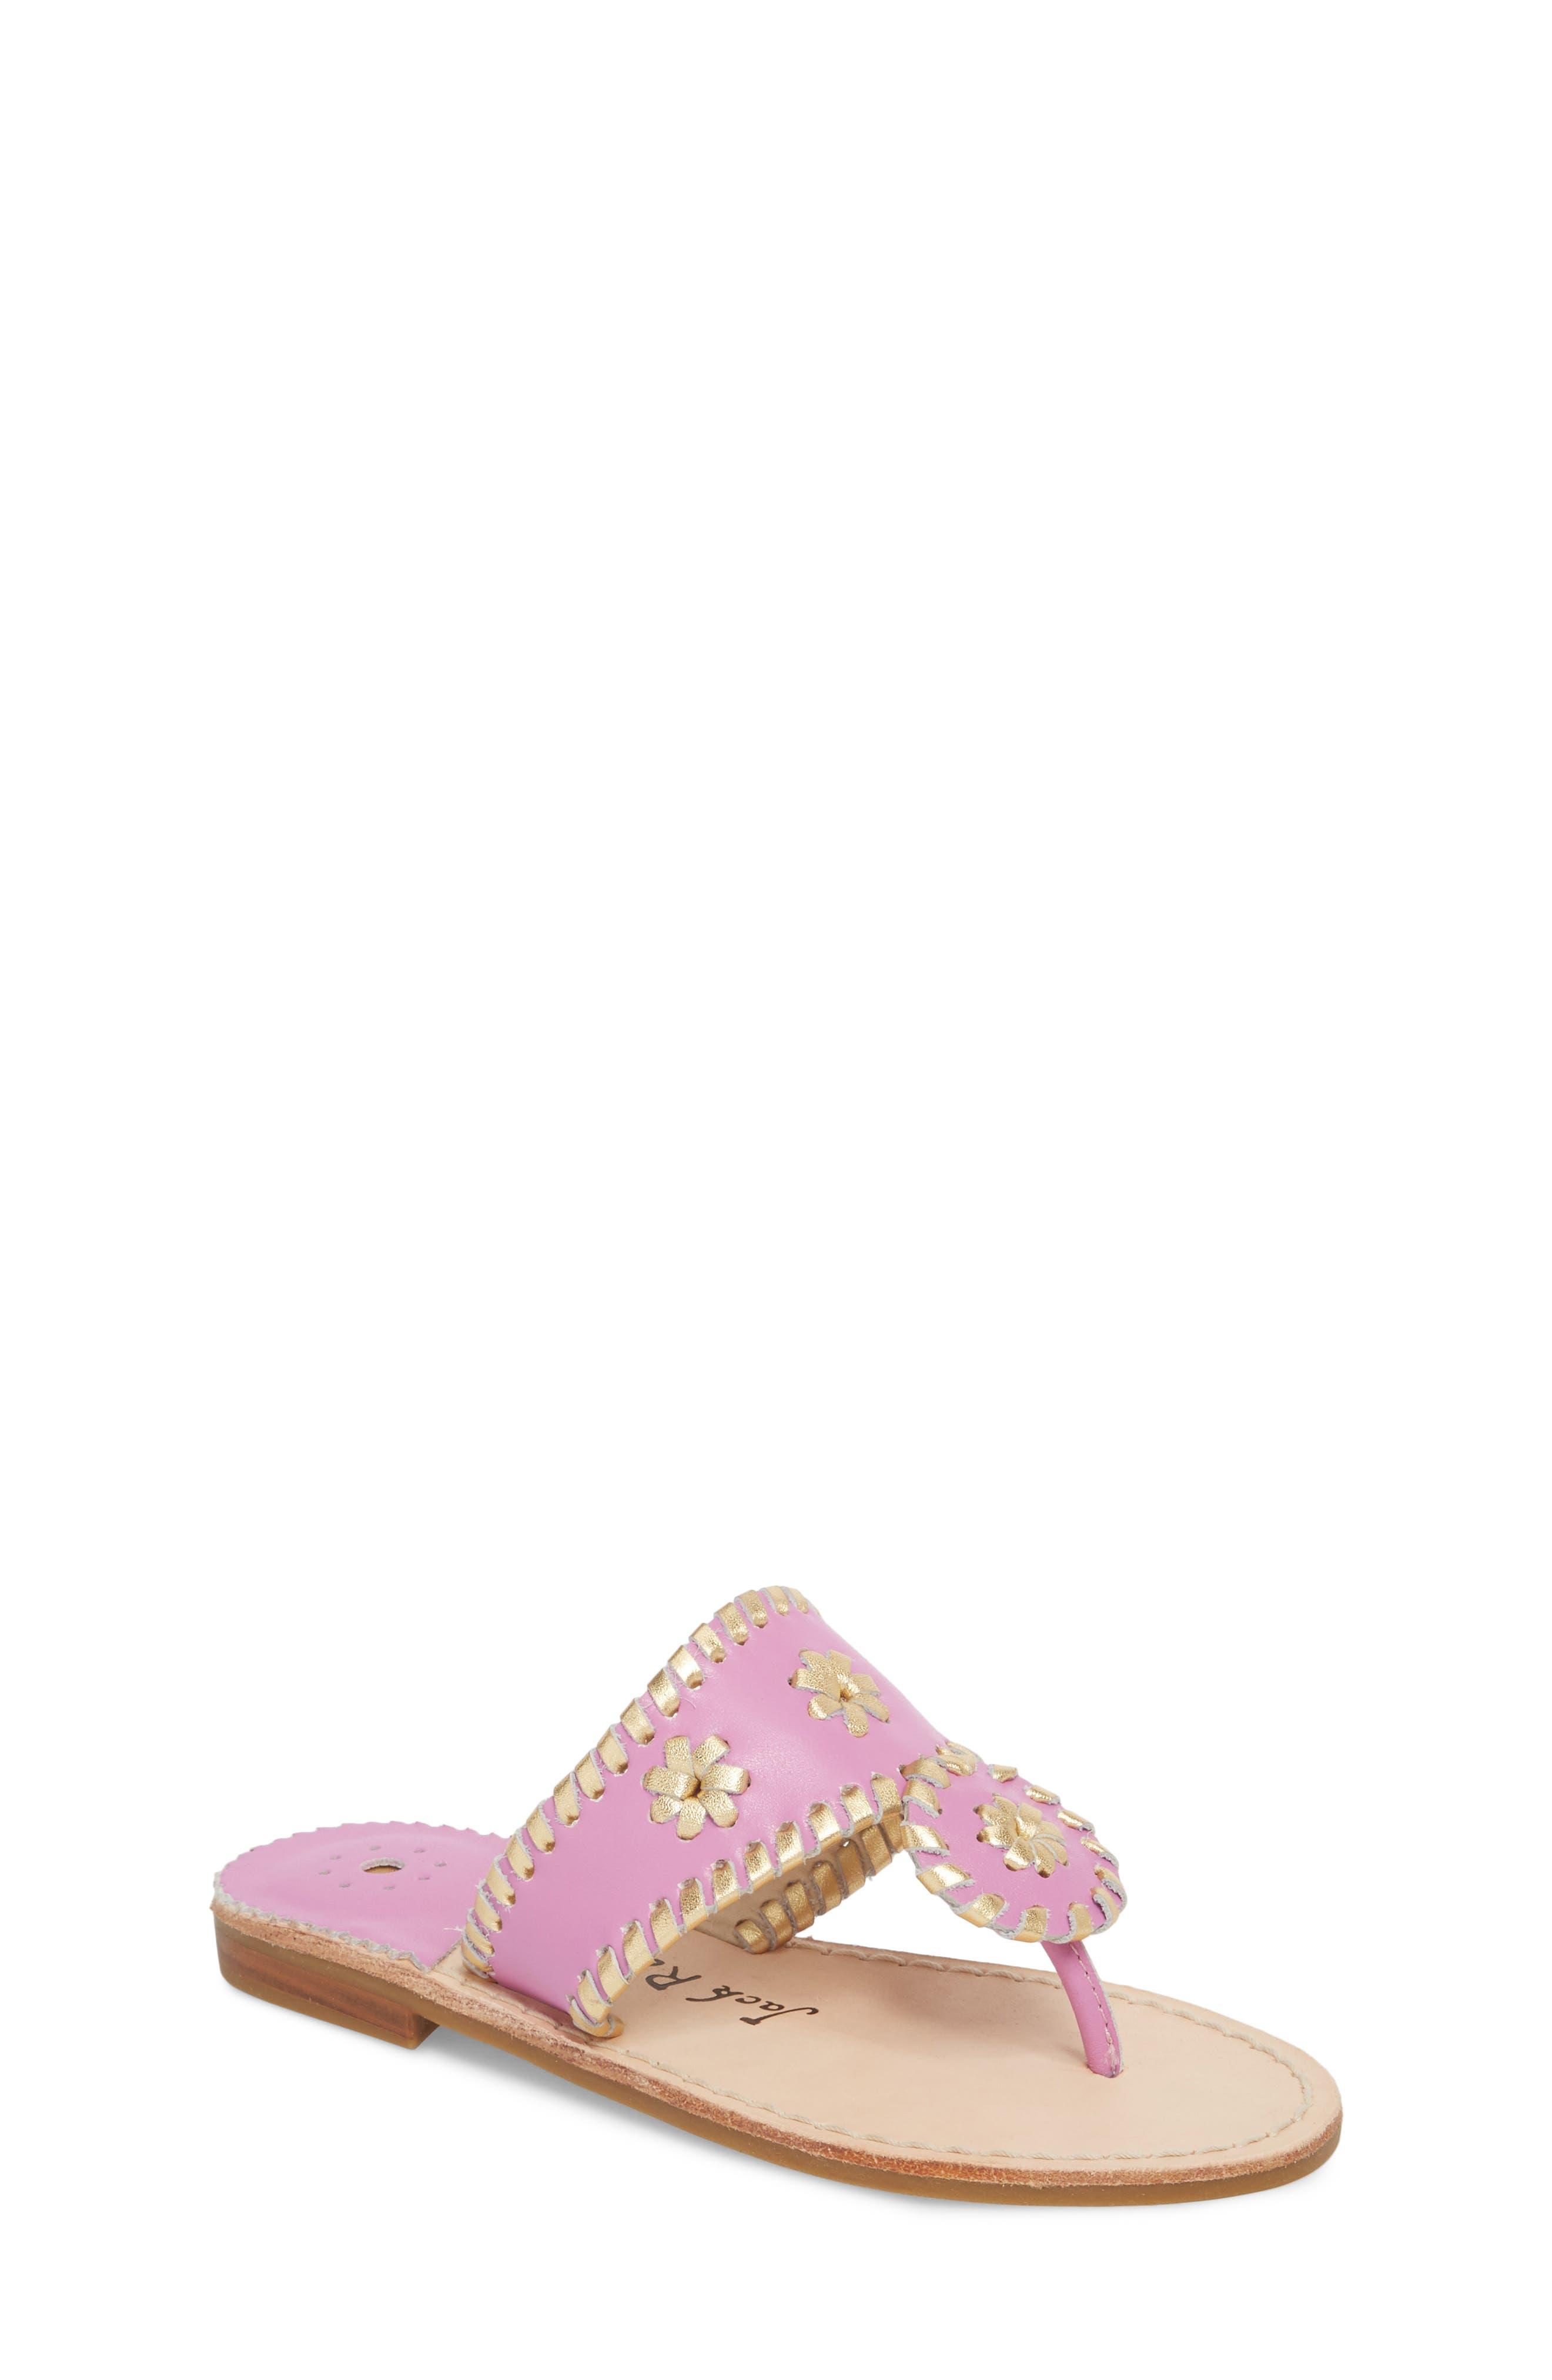 Miss Hollis Metallic Trim Thong Sandal,                         Main,                         color, Lavender Pink/ Gold Leather